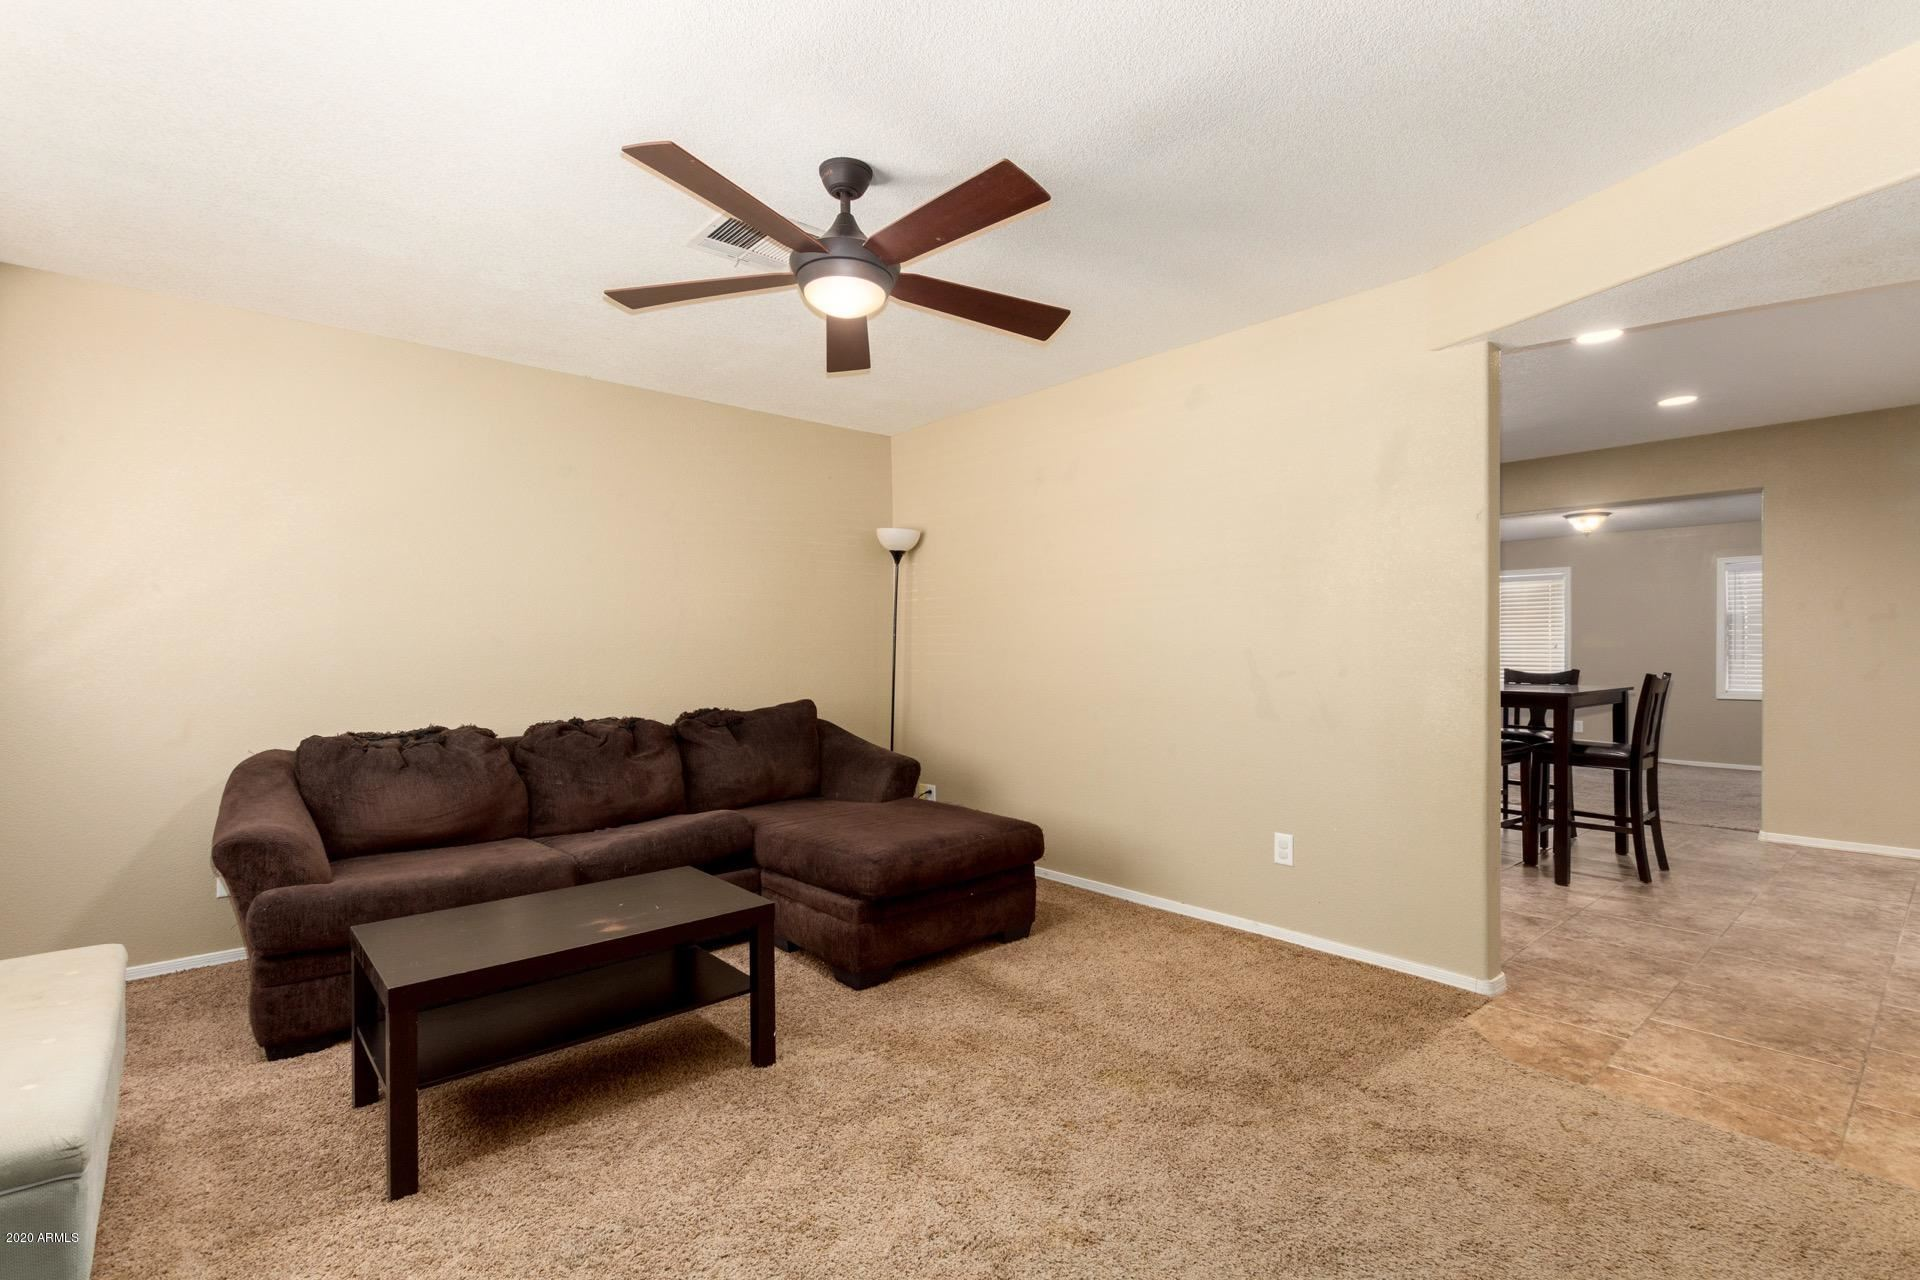 Photo of 1764 S 80TH Place, Mesa, AZ 85209 (MLS # 6058542)